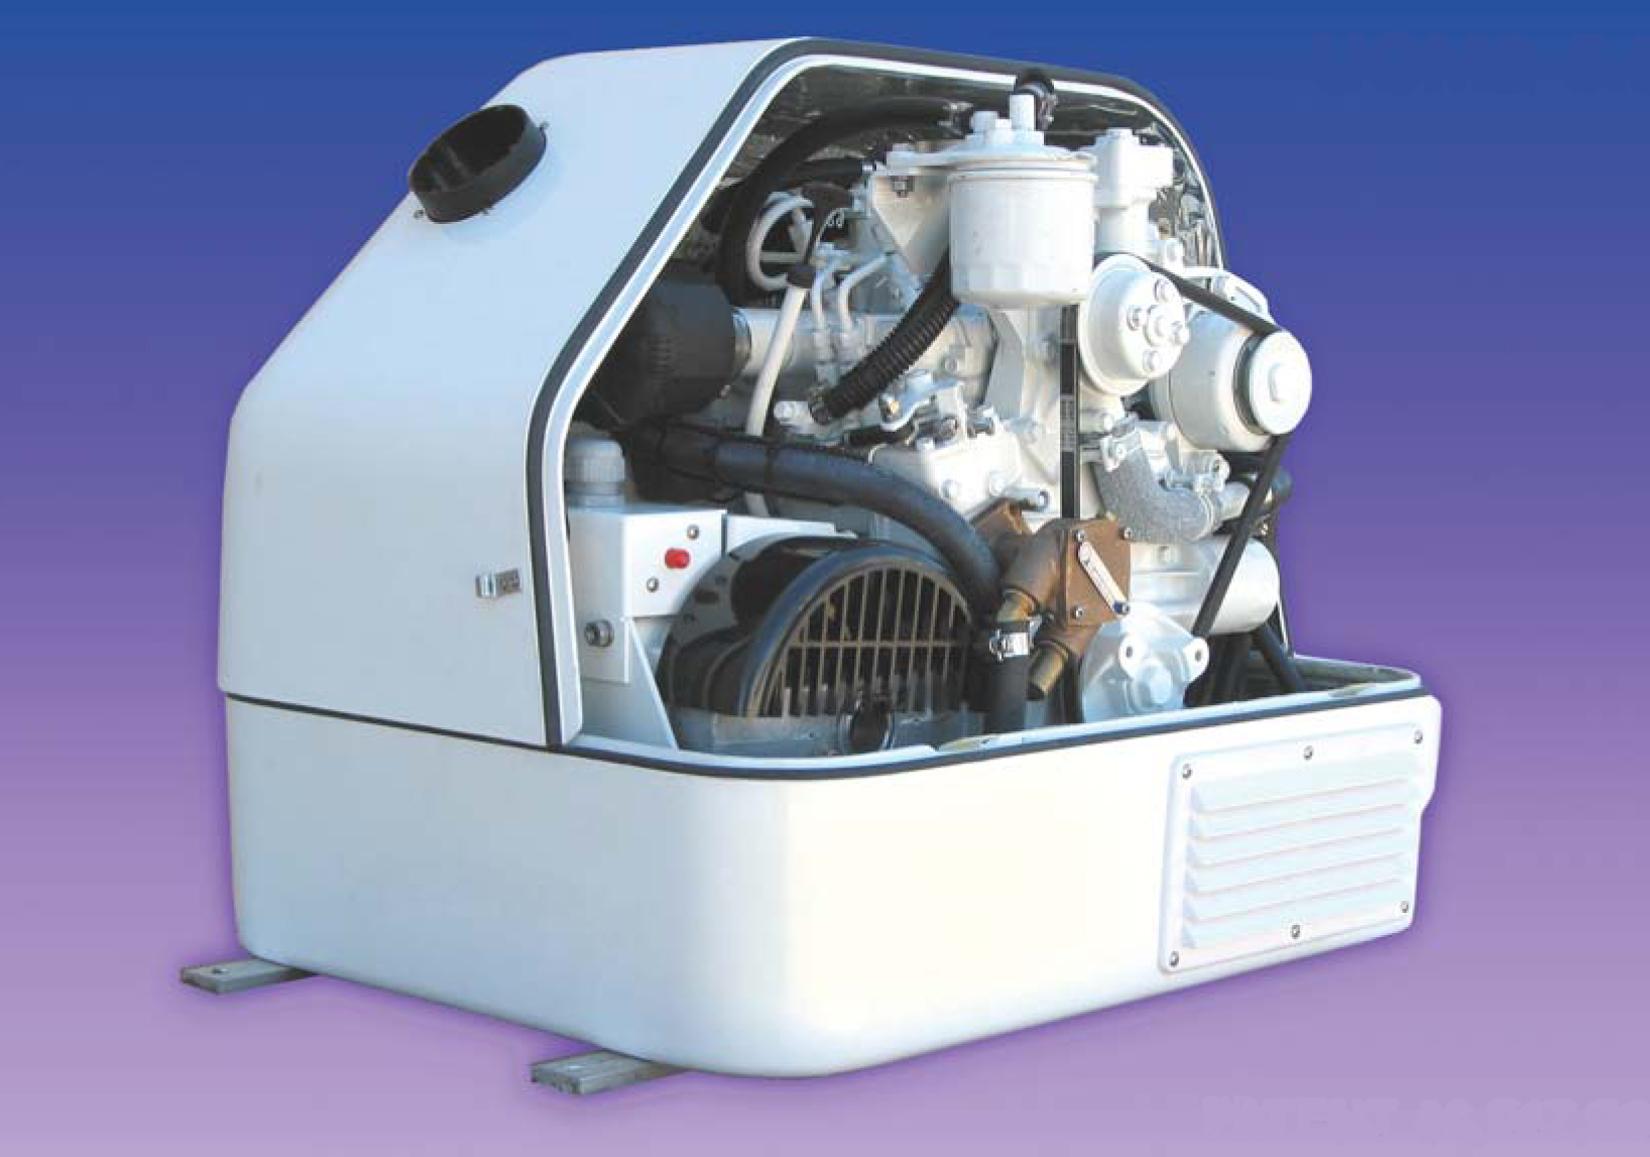 2 10 gph fuel consumption